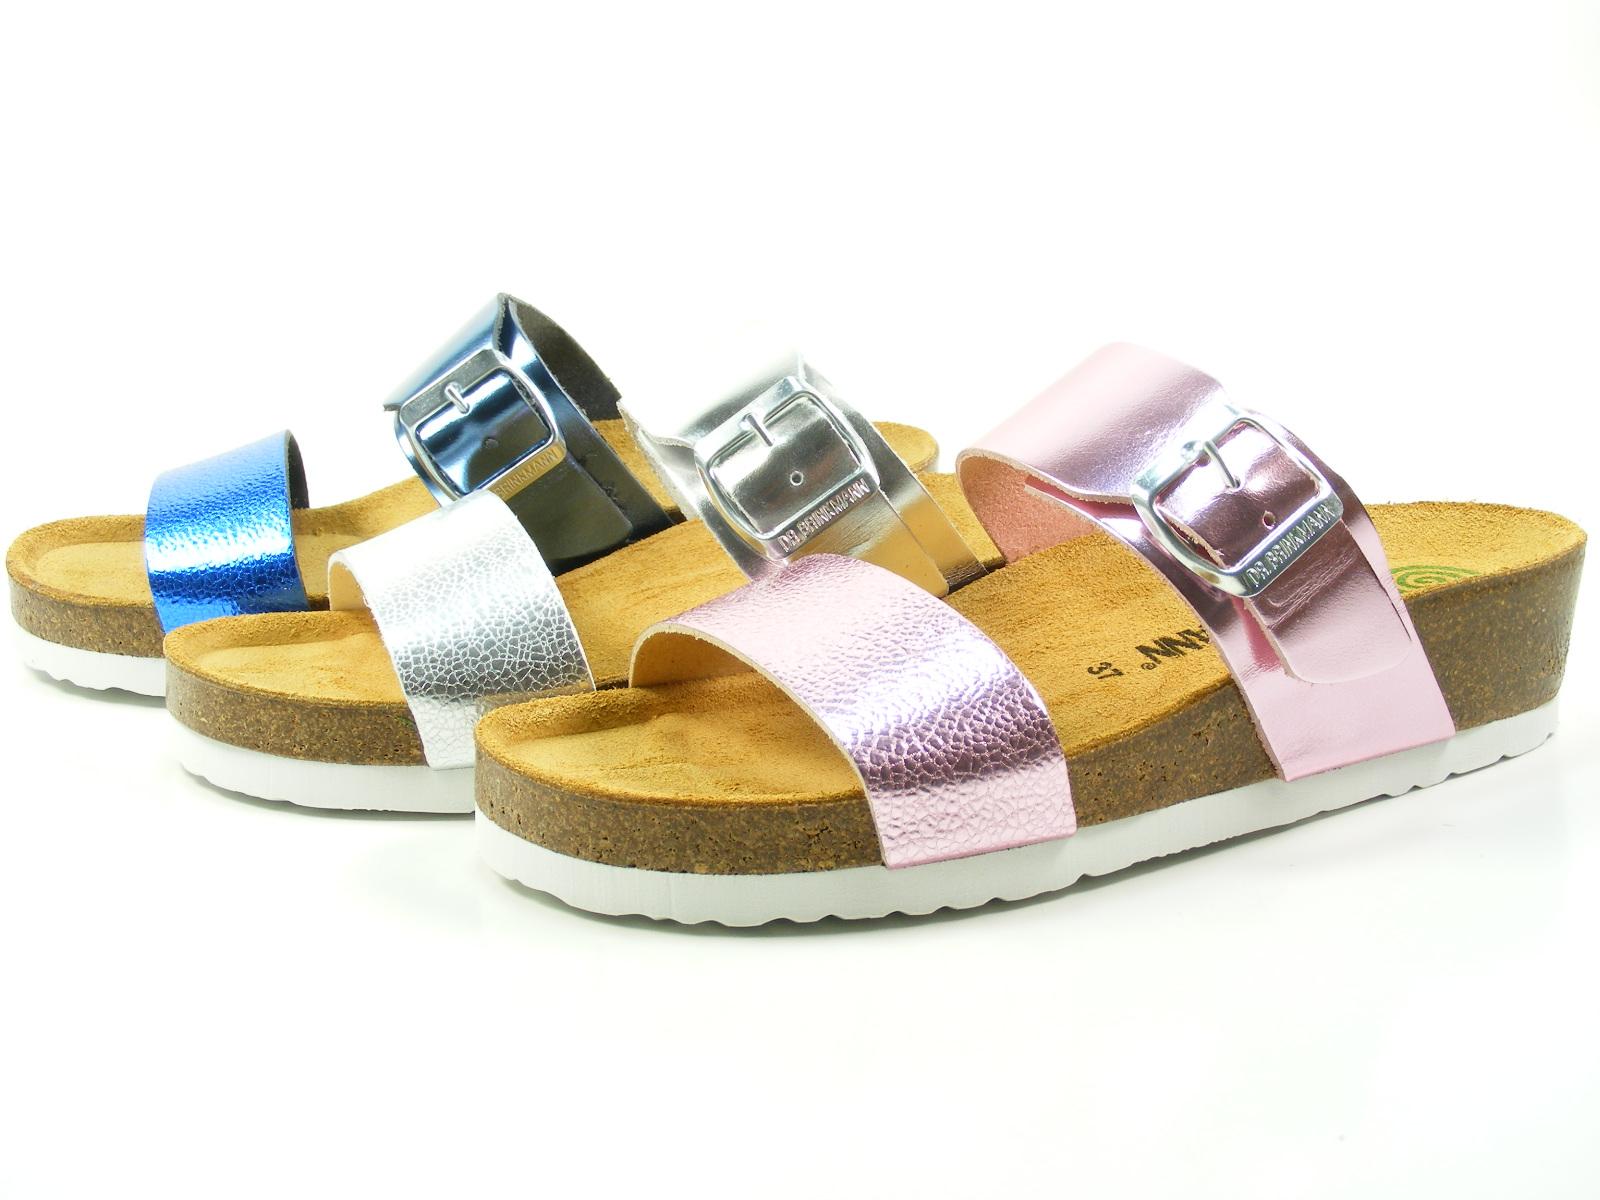 Dr. Brinkmann Schuhe 701144 Damen Metallic Keil Pantoletten Sandalen Clogs